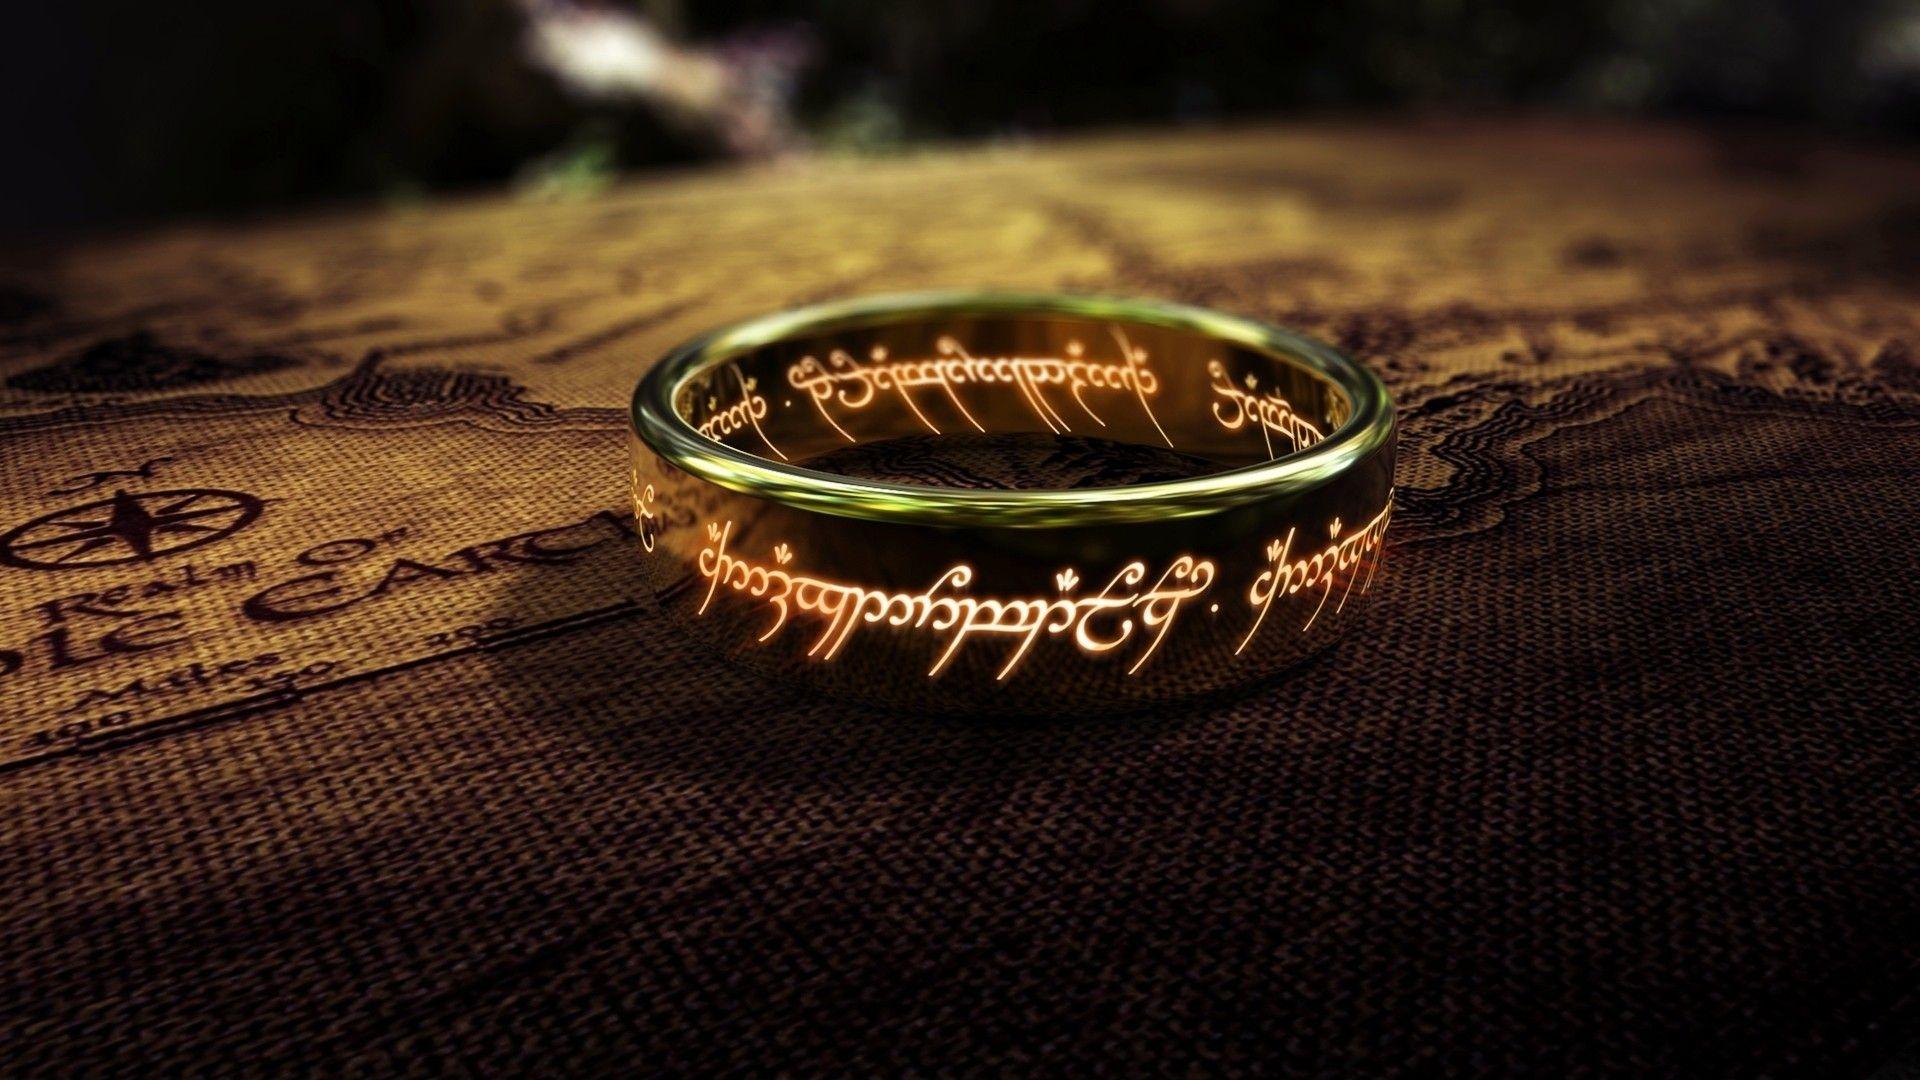 the lord of the rings engraving hd wallpaper » fullhdwpp - full hd